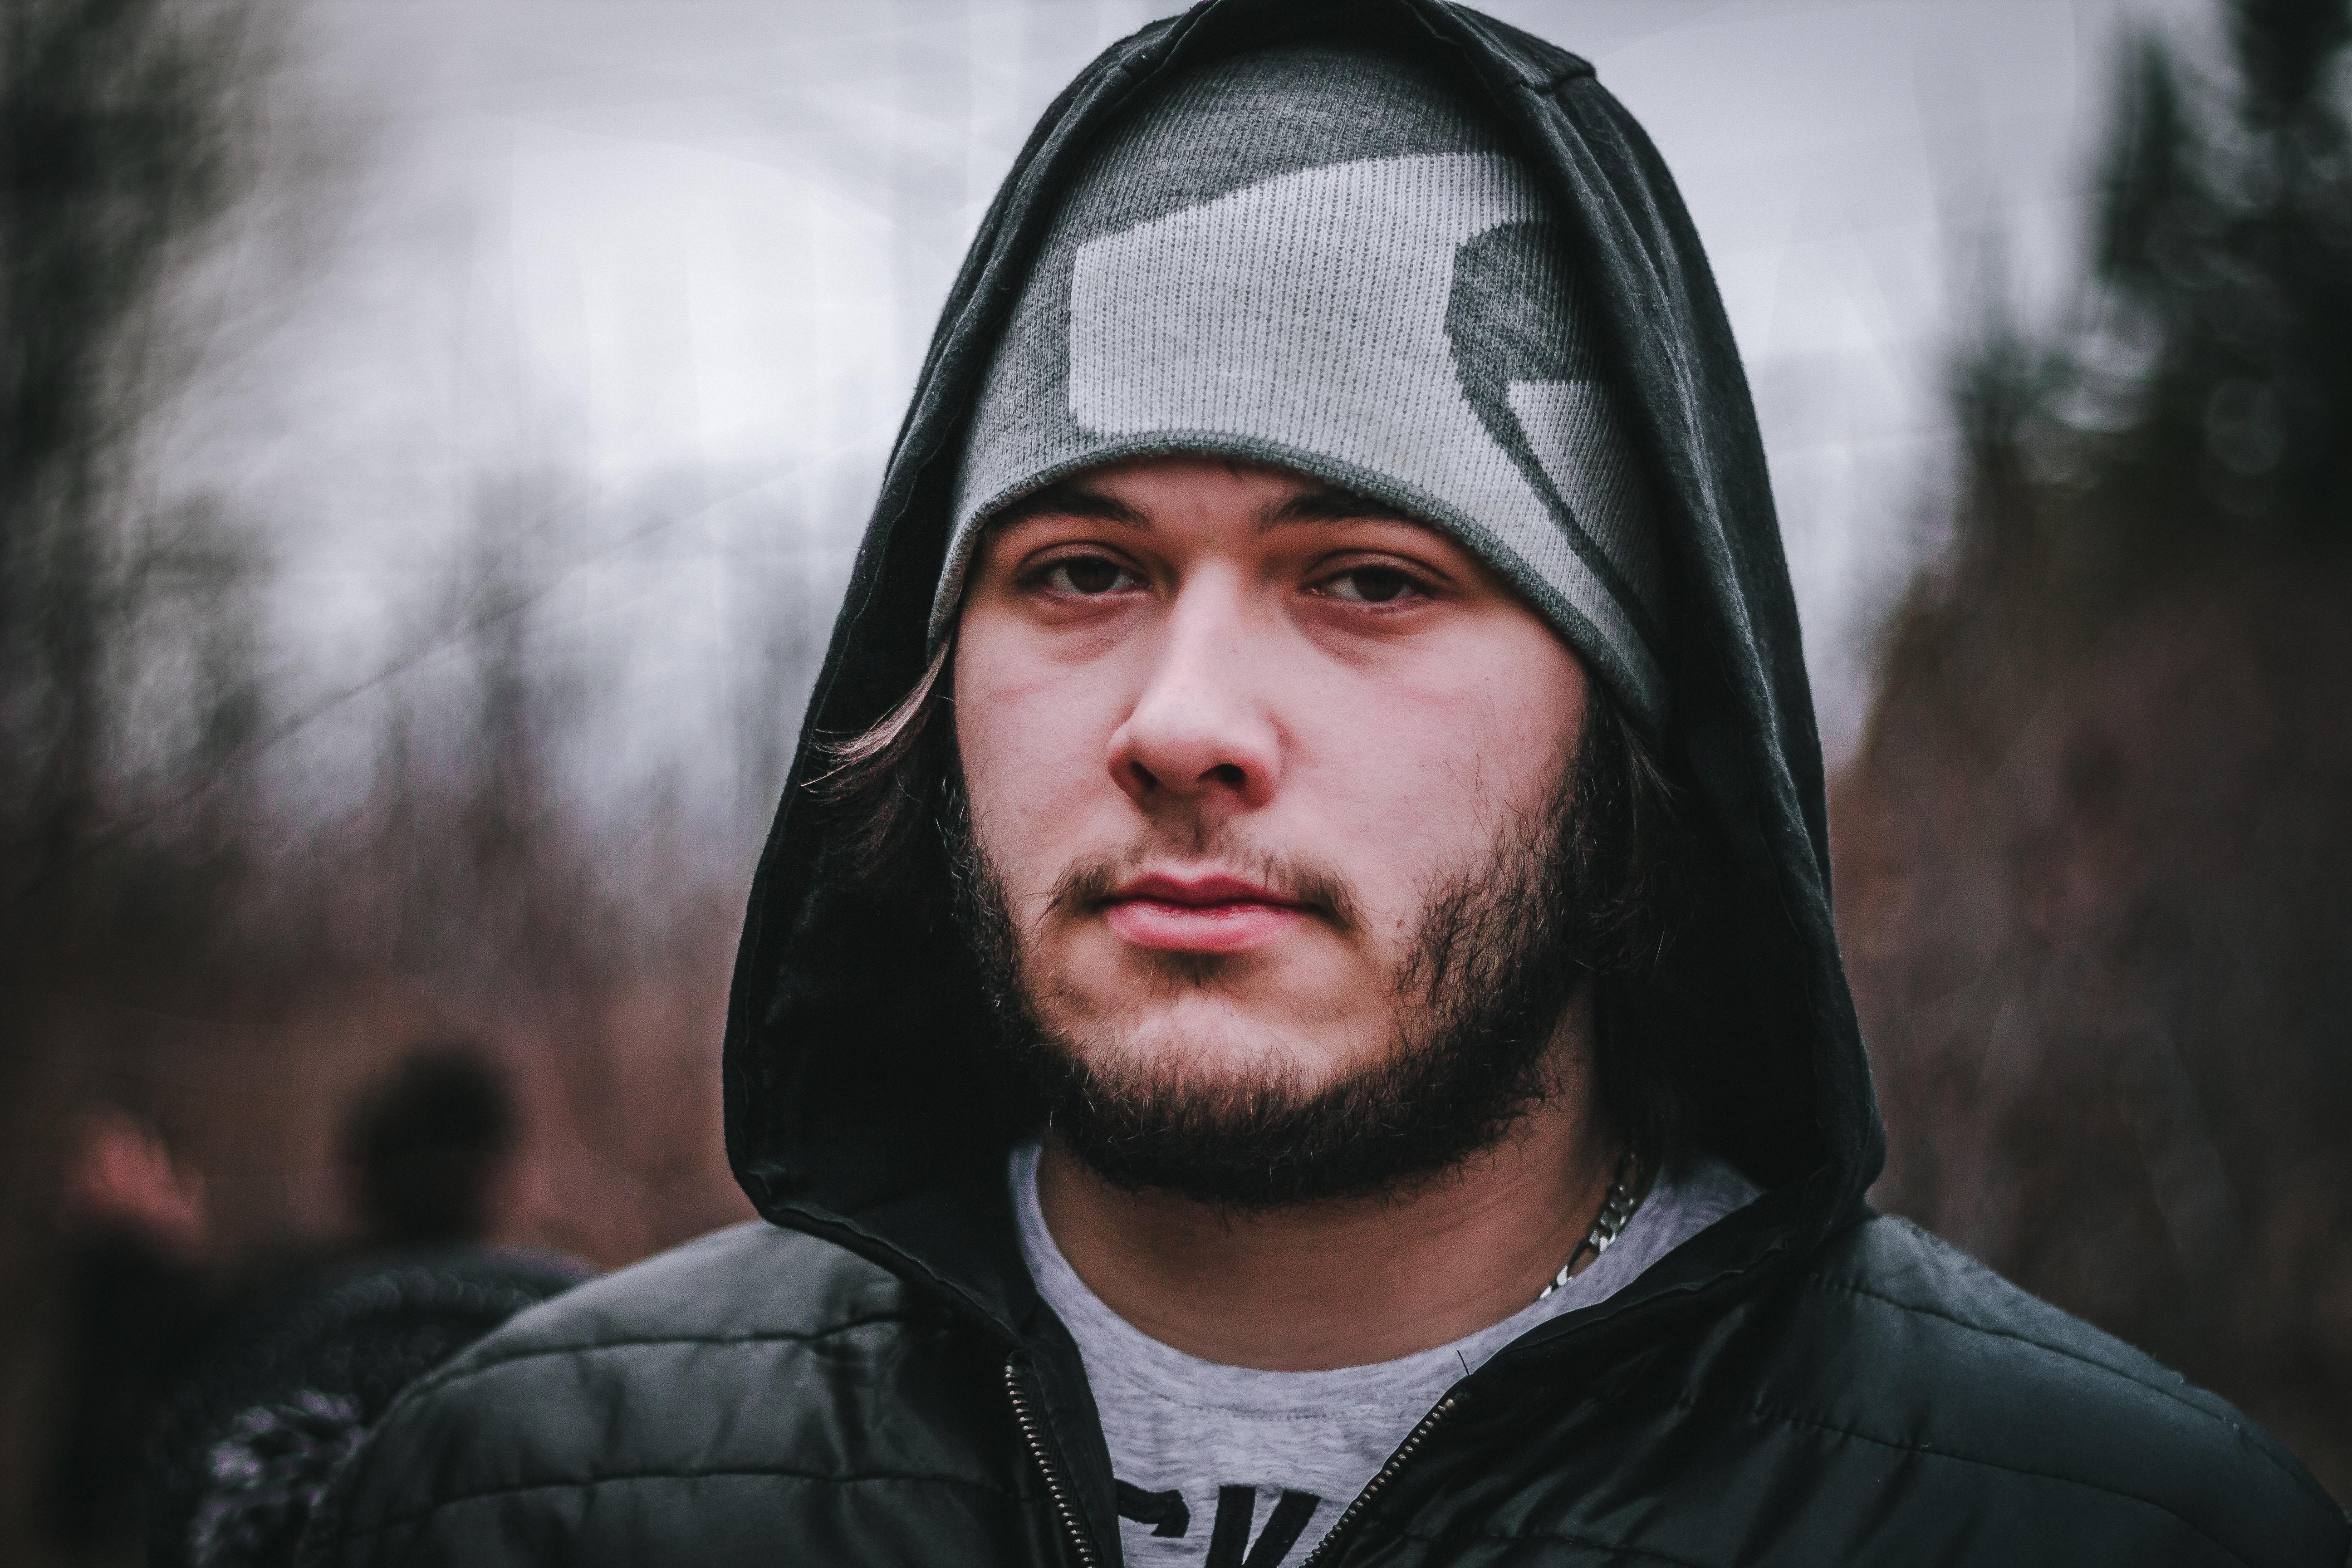 man wearing gray knit cap